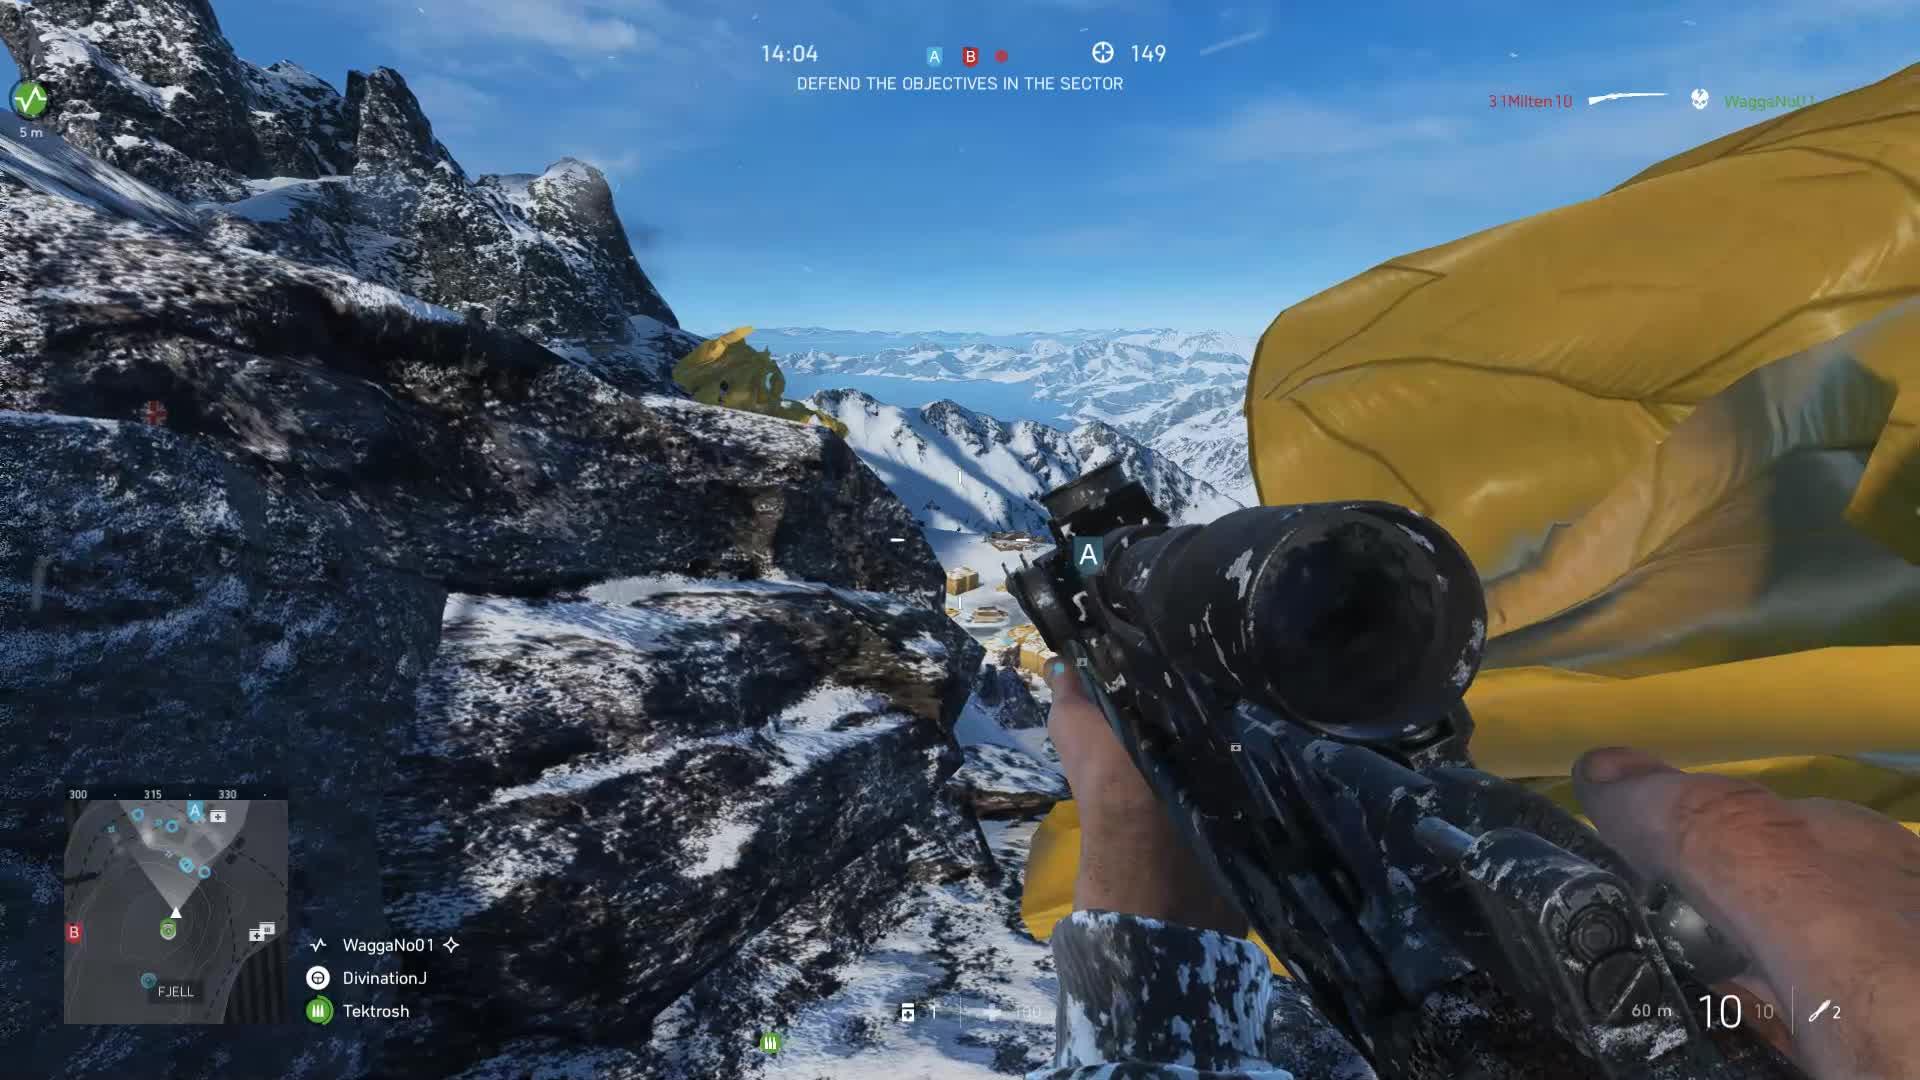 BF5, BFV, Battlefield 5, Battlefield Sniper, Battlefield V, BattlefieldV, King of the Fjell 652 Mountain! GIFs